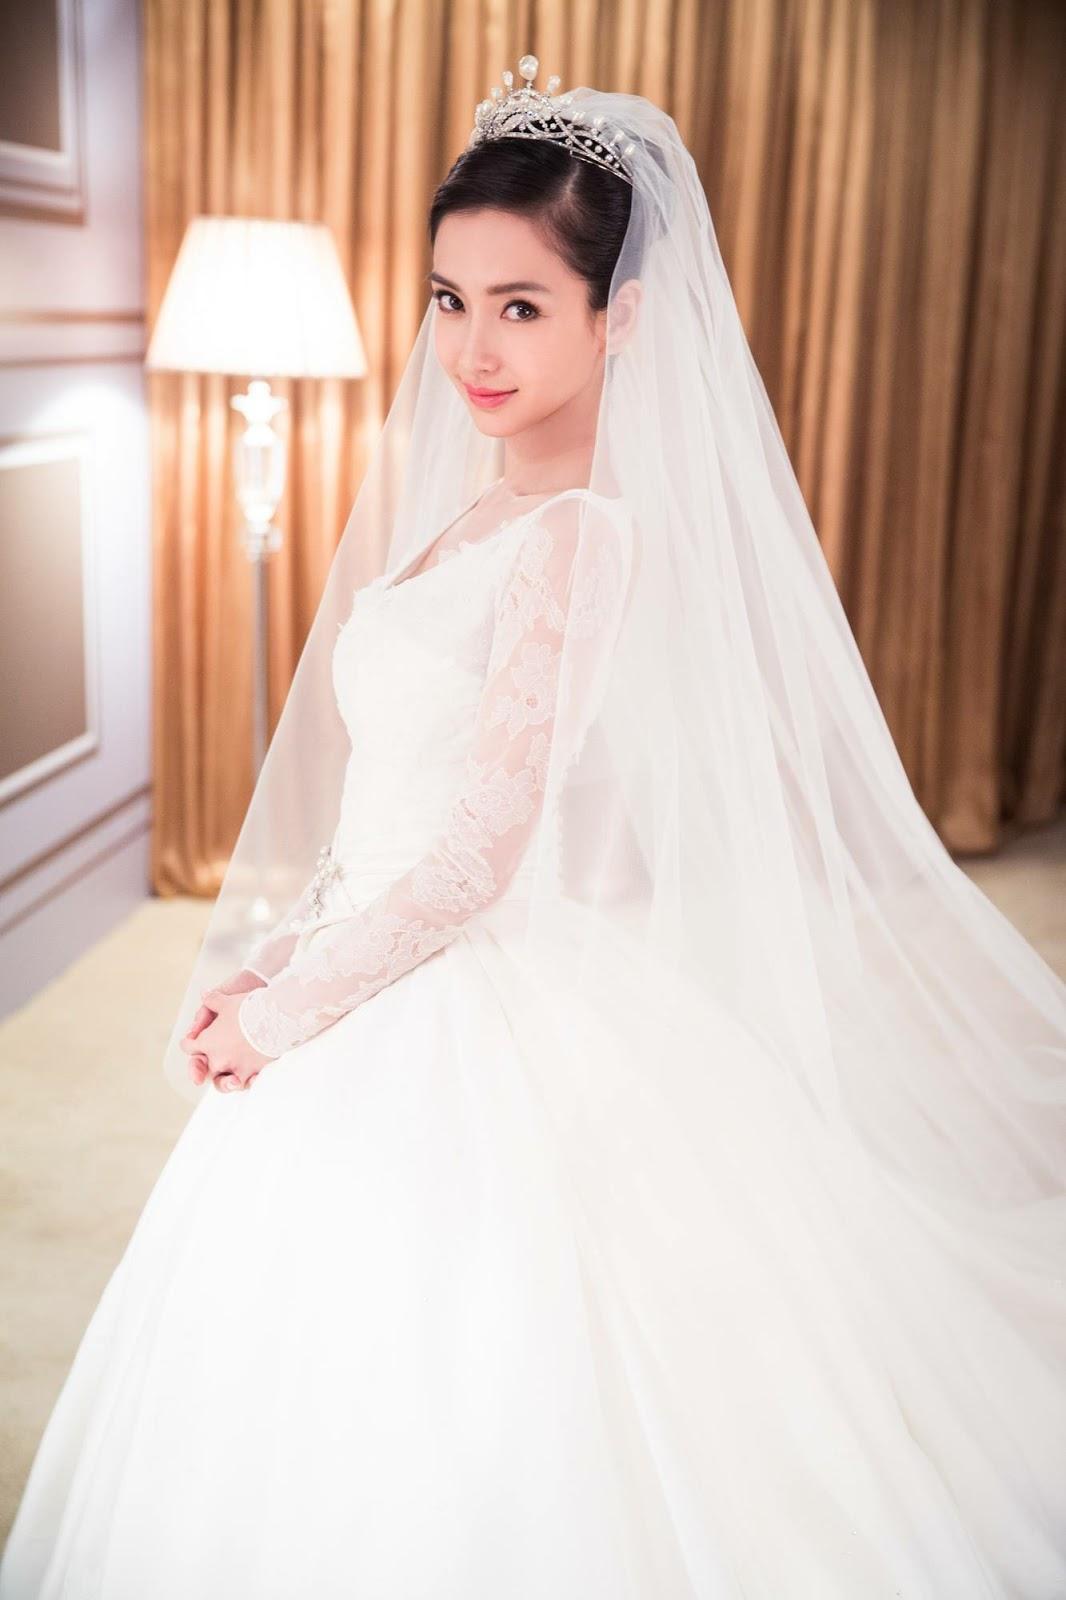 Angela Yeung Wedding Gift Bags : Urban Bride: AngelaBaby and Huang Xiaoming, Chinas Wedding of the ...